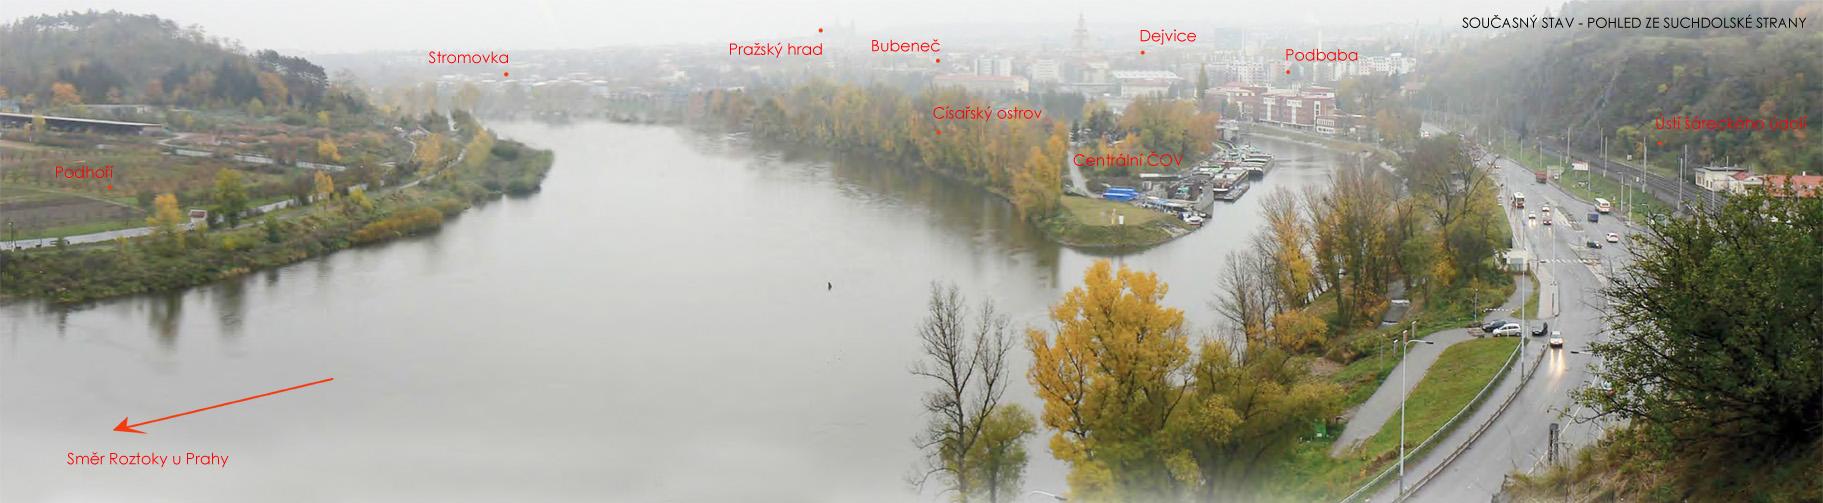 Nová vltavská lávka v Praze: Podbaba -Trója